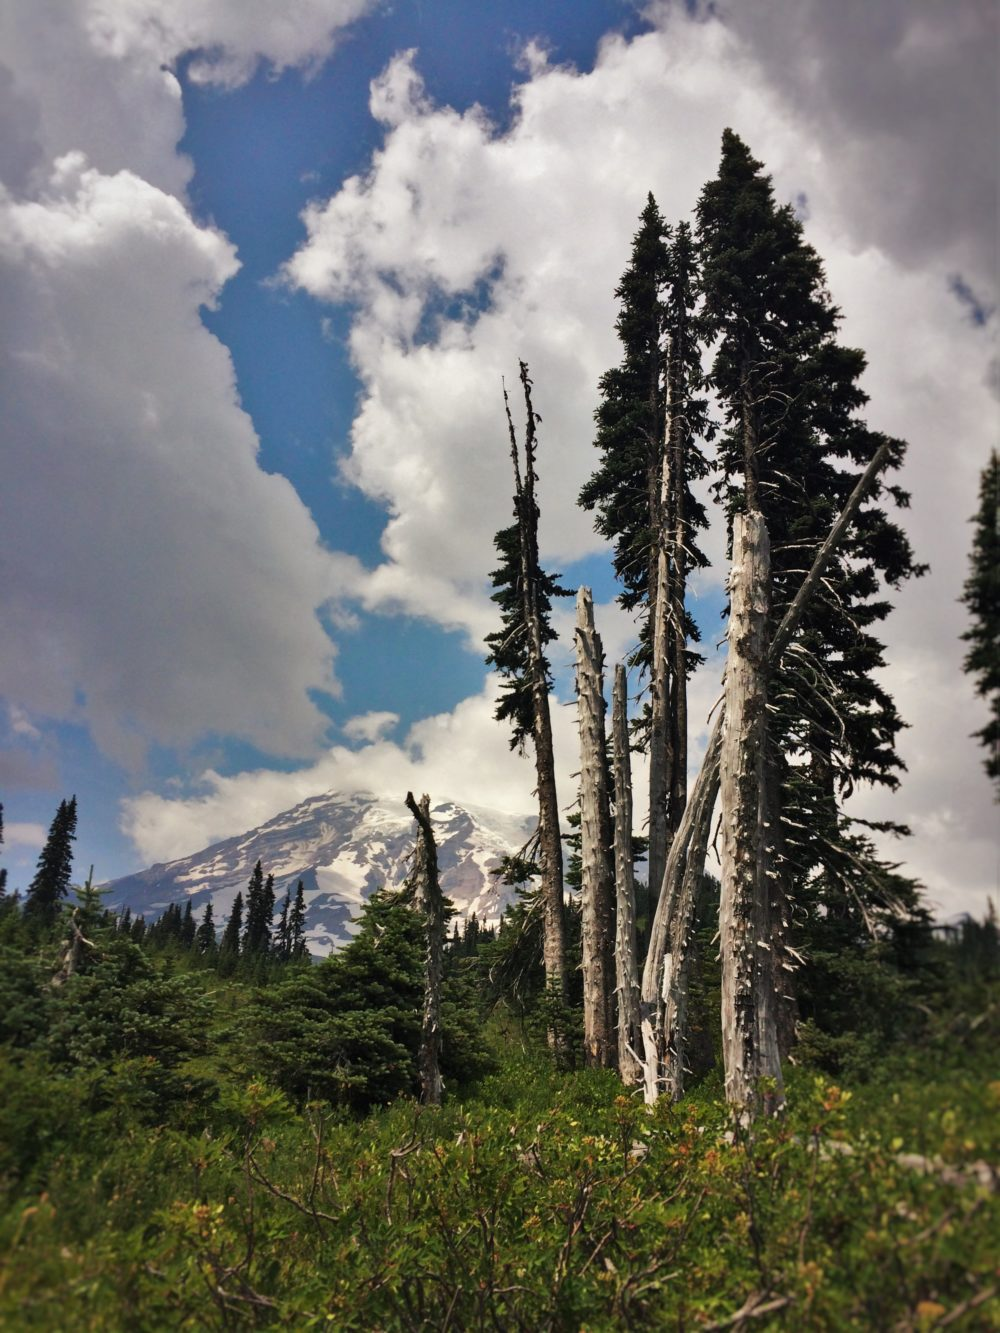 Mountain-View-of-in-Mount-Rainier-National-Park-2-e1497999510816.jpg